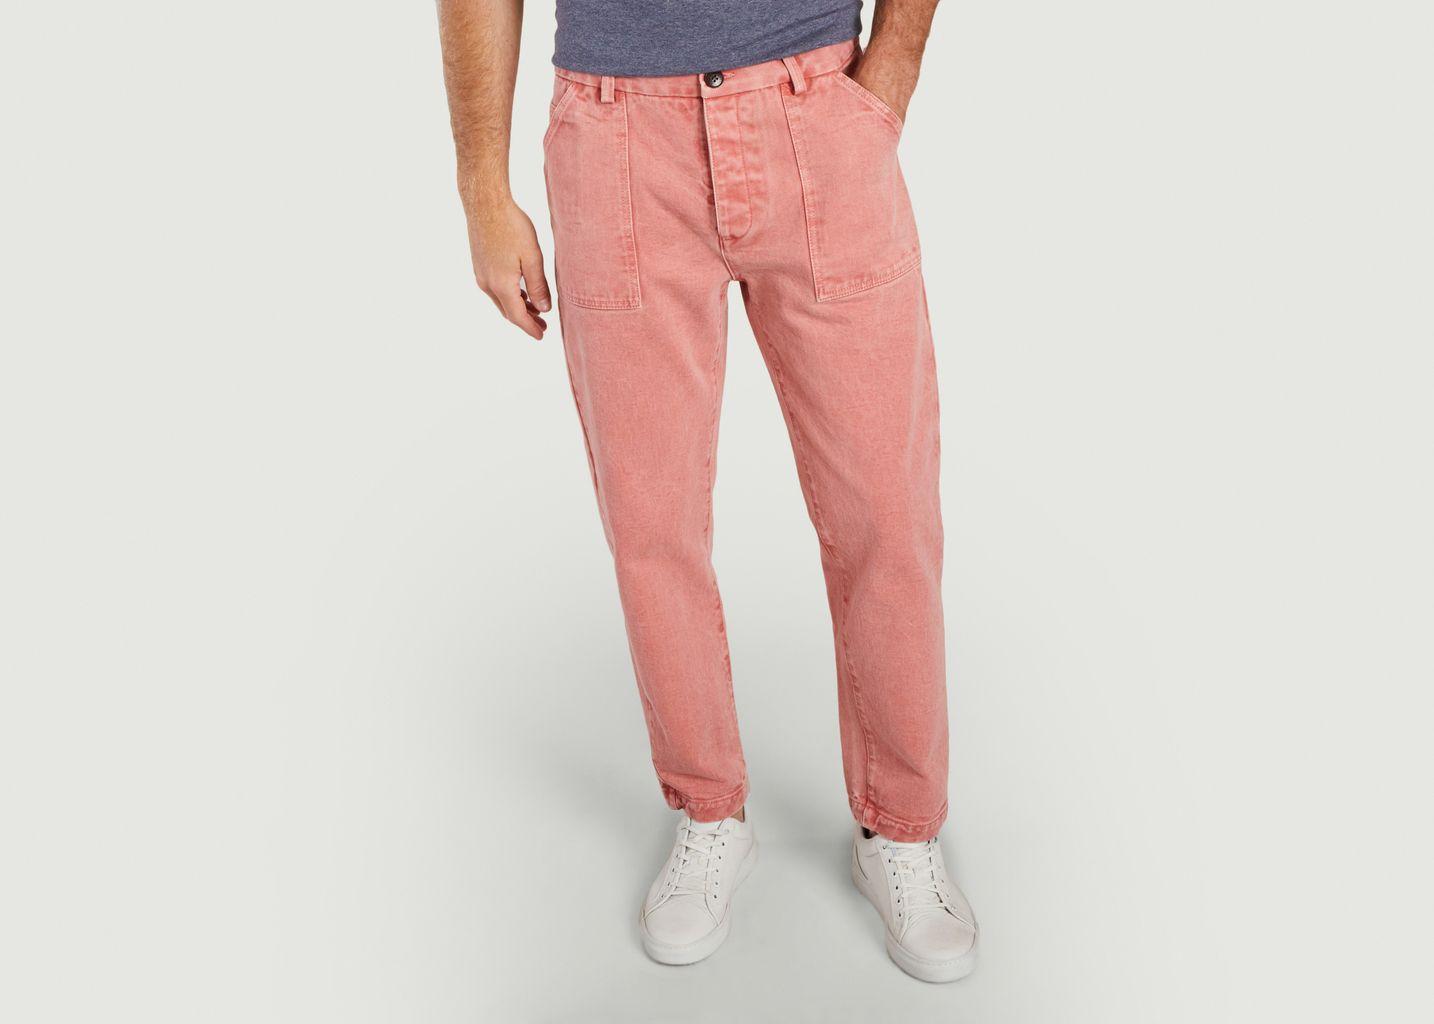 Pantalon Chino Pocket - Cuisse de Grenouille